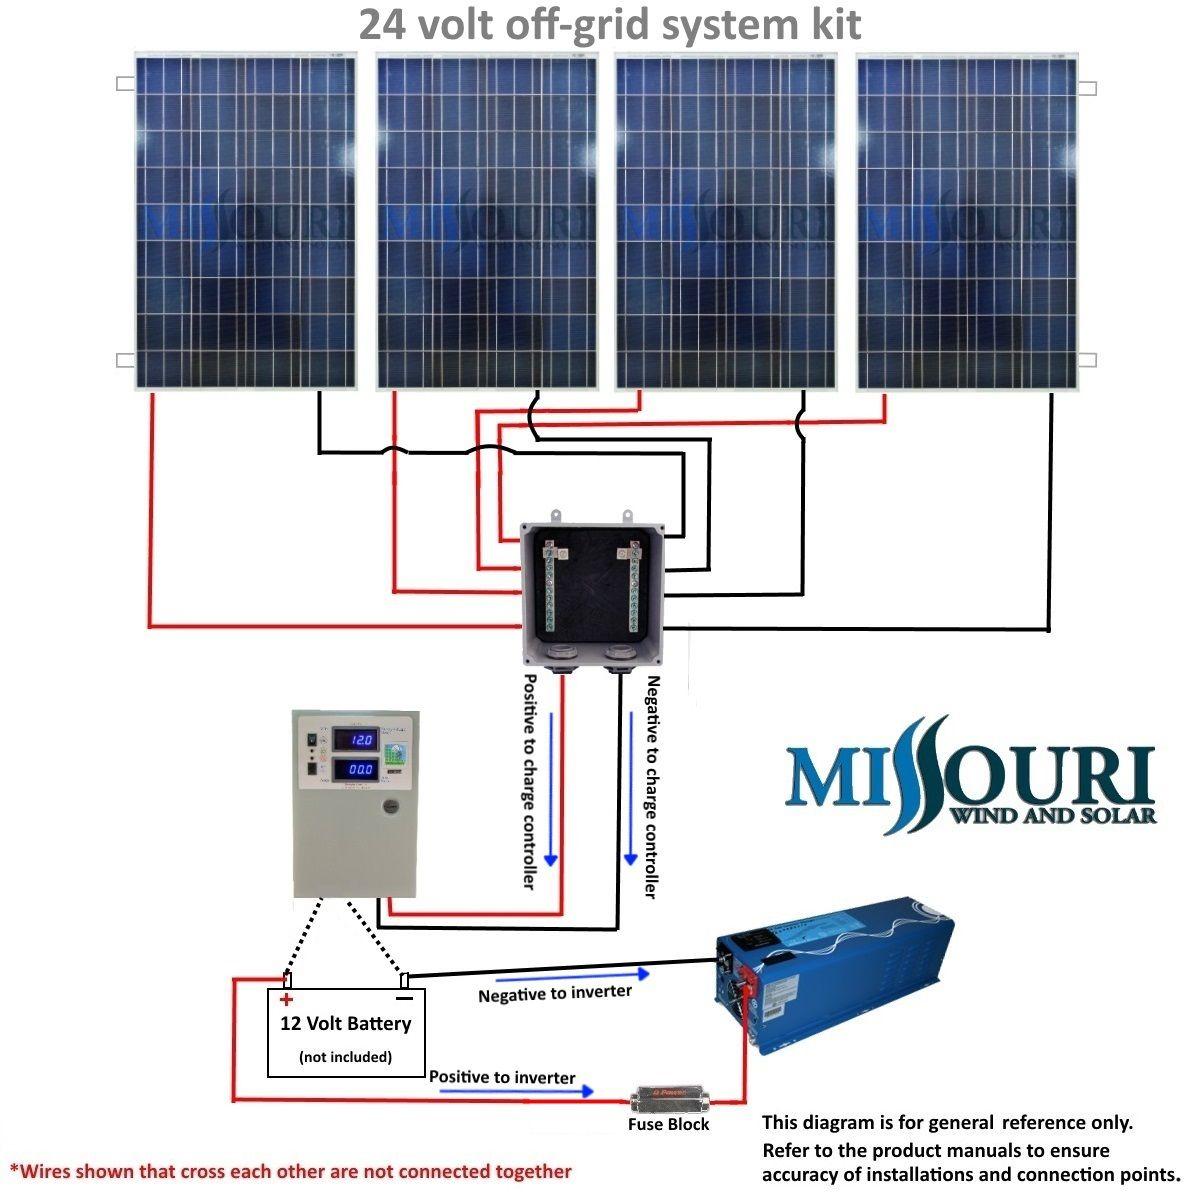 1000 Watt 24 Volt Off Grid Solar Panel Kit | Techno | Solar Panels - Solar Panel Wiring Diagram